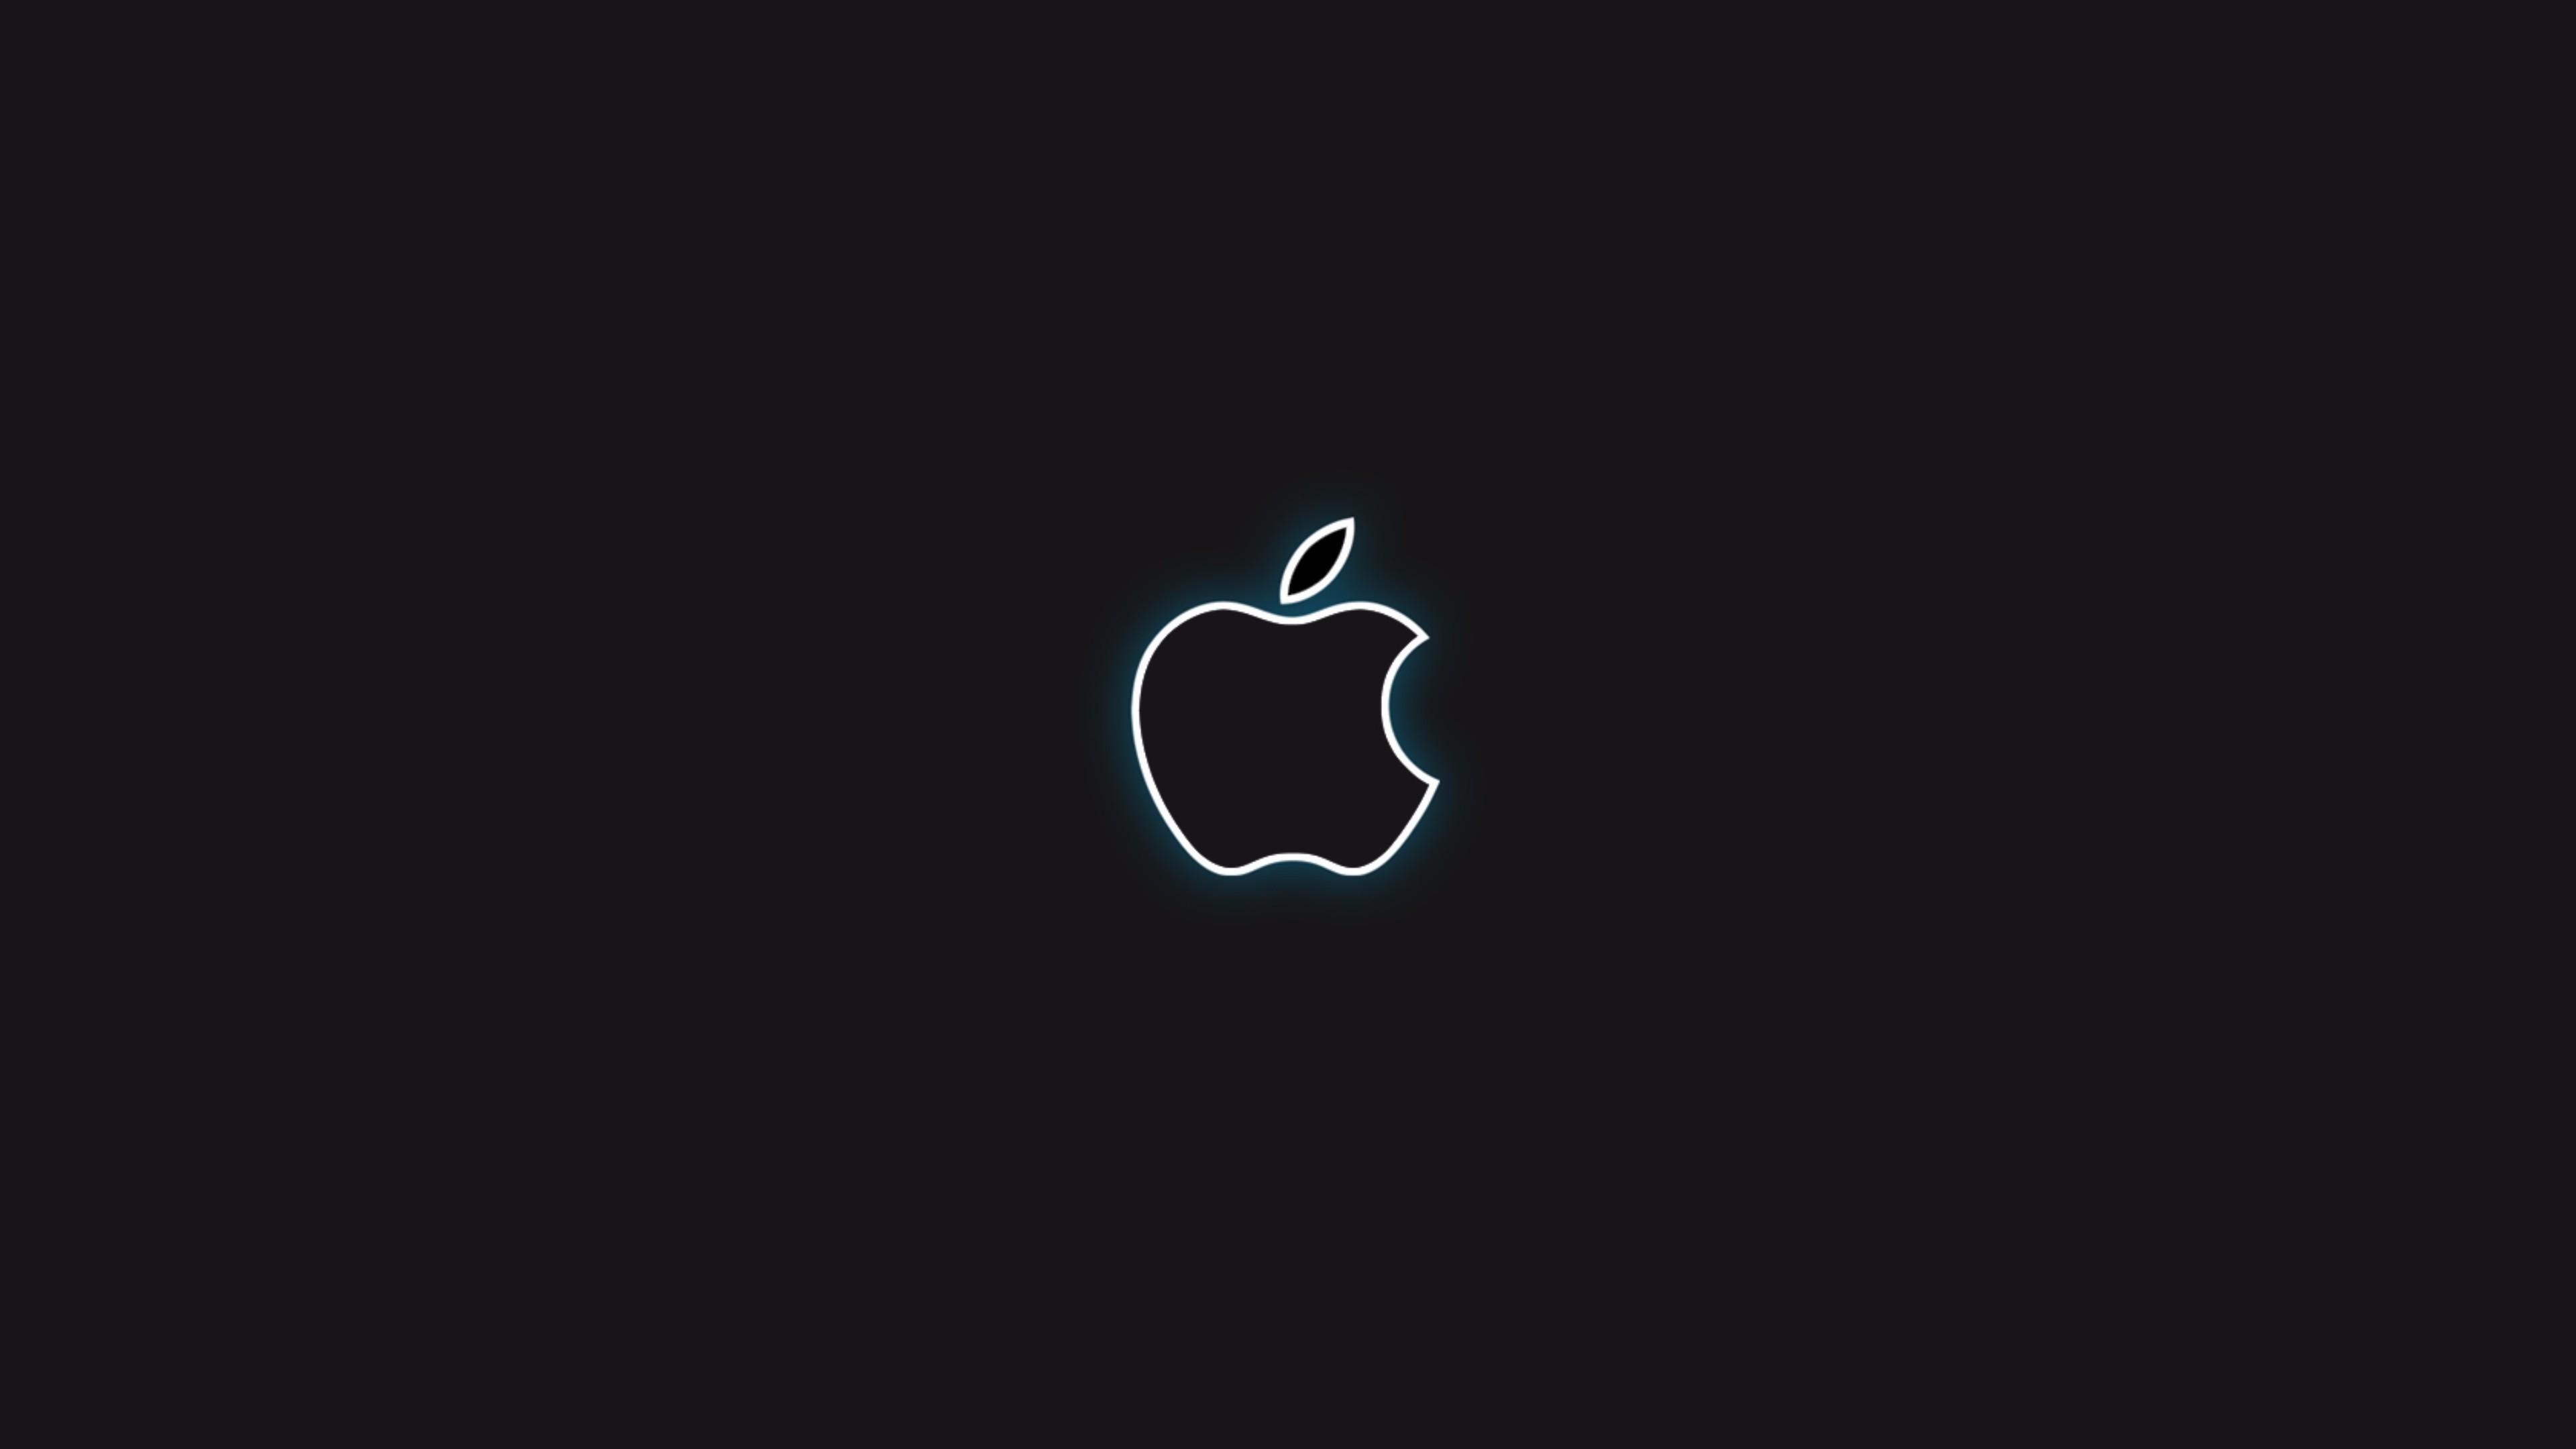 black apple logo 4k wallpaper | free 4k wallpaper